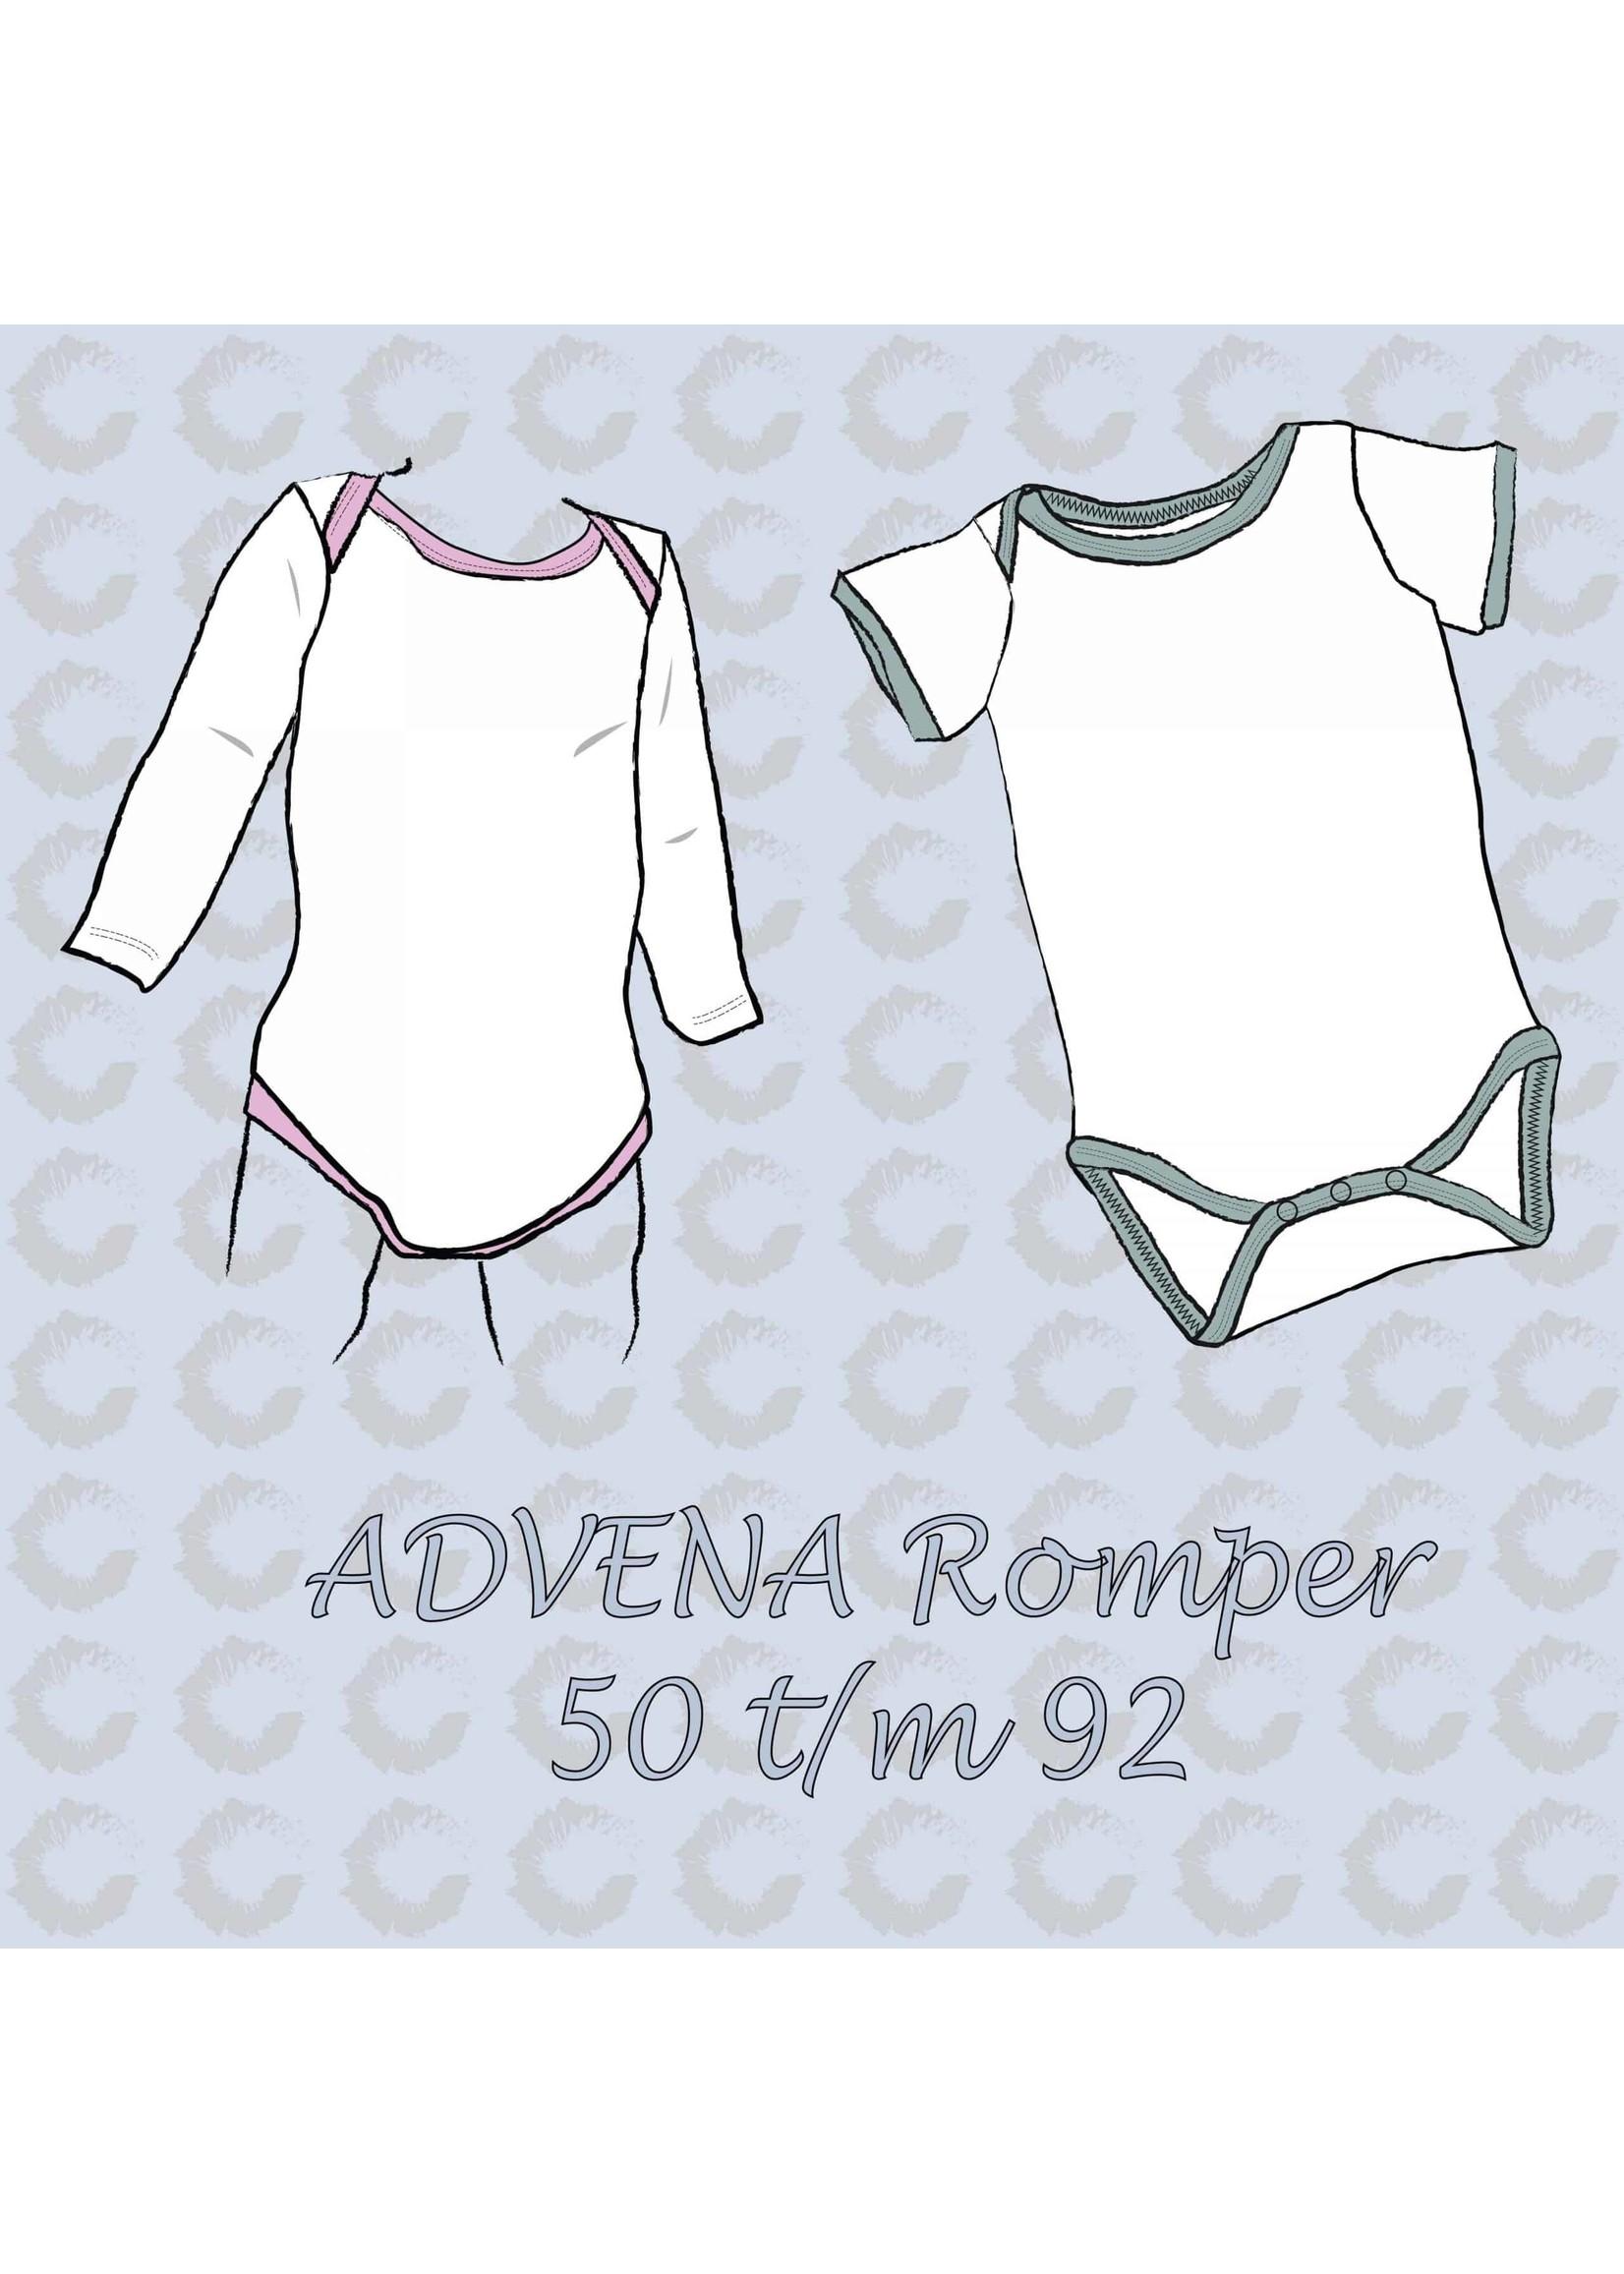 Workshop - Advena Romper (29/07)